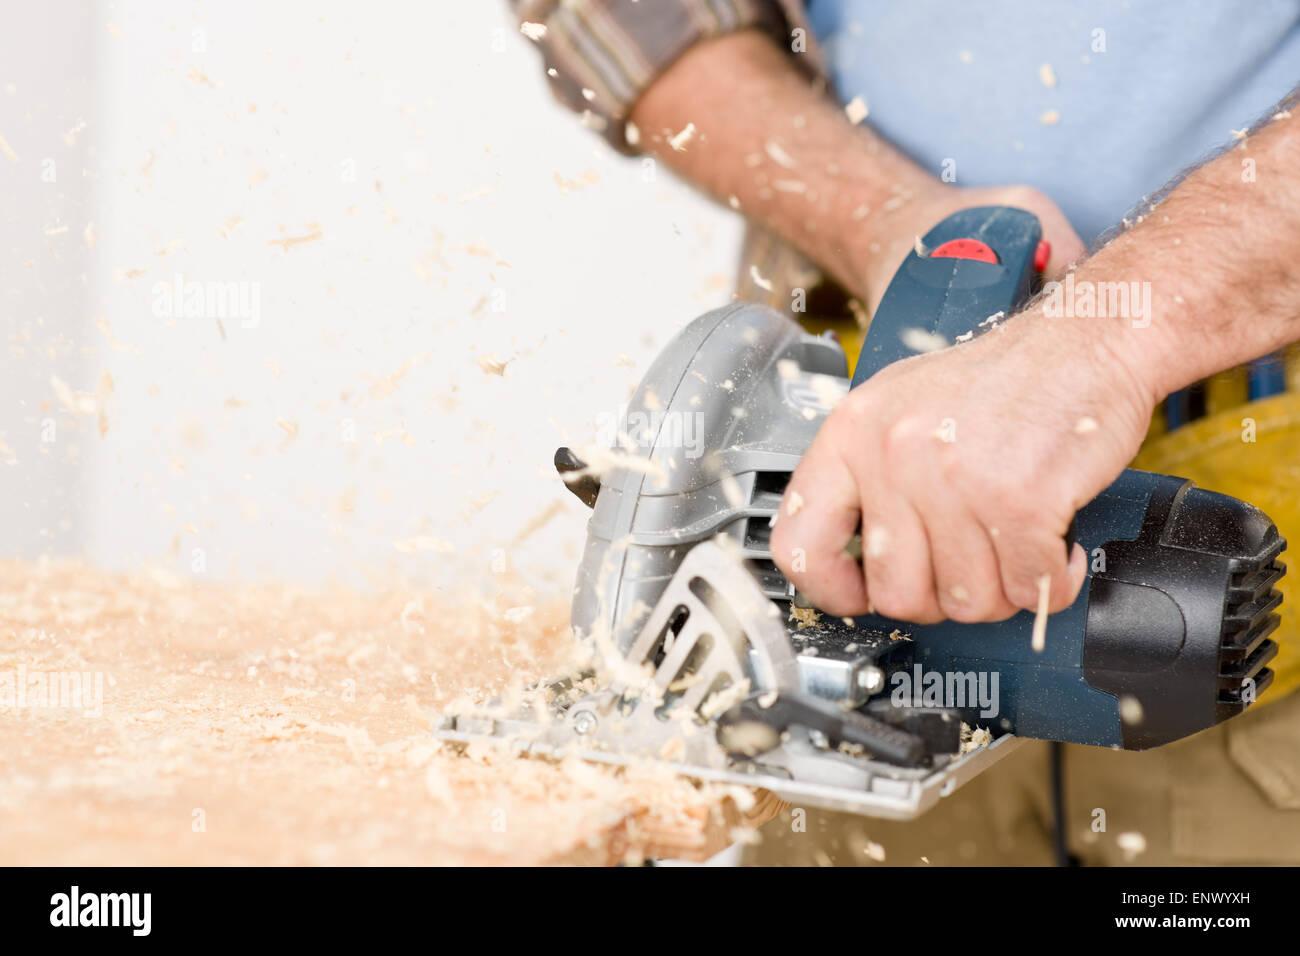 Home improvement - handyman cut wood with jigsaw Stock Photo